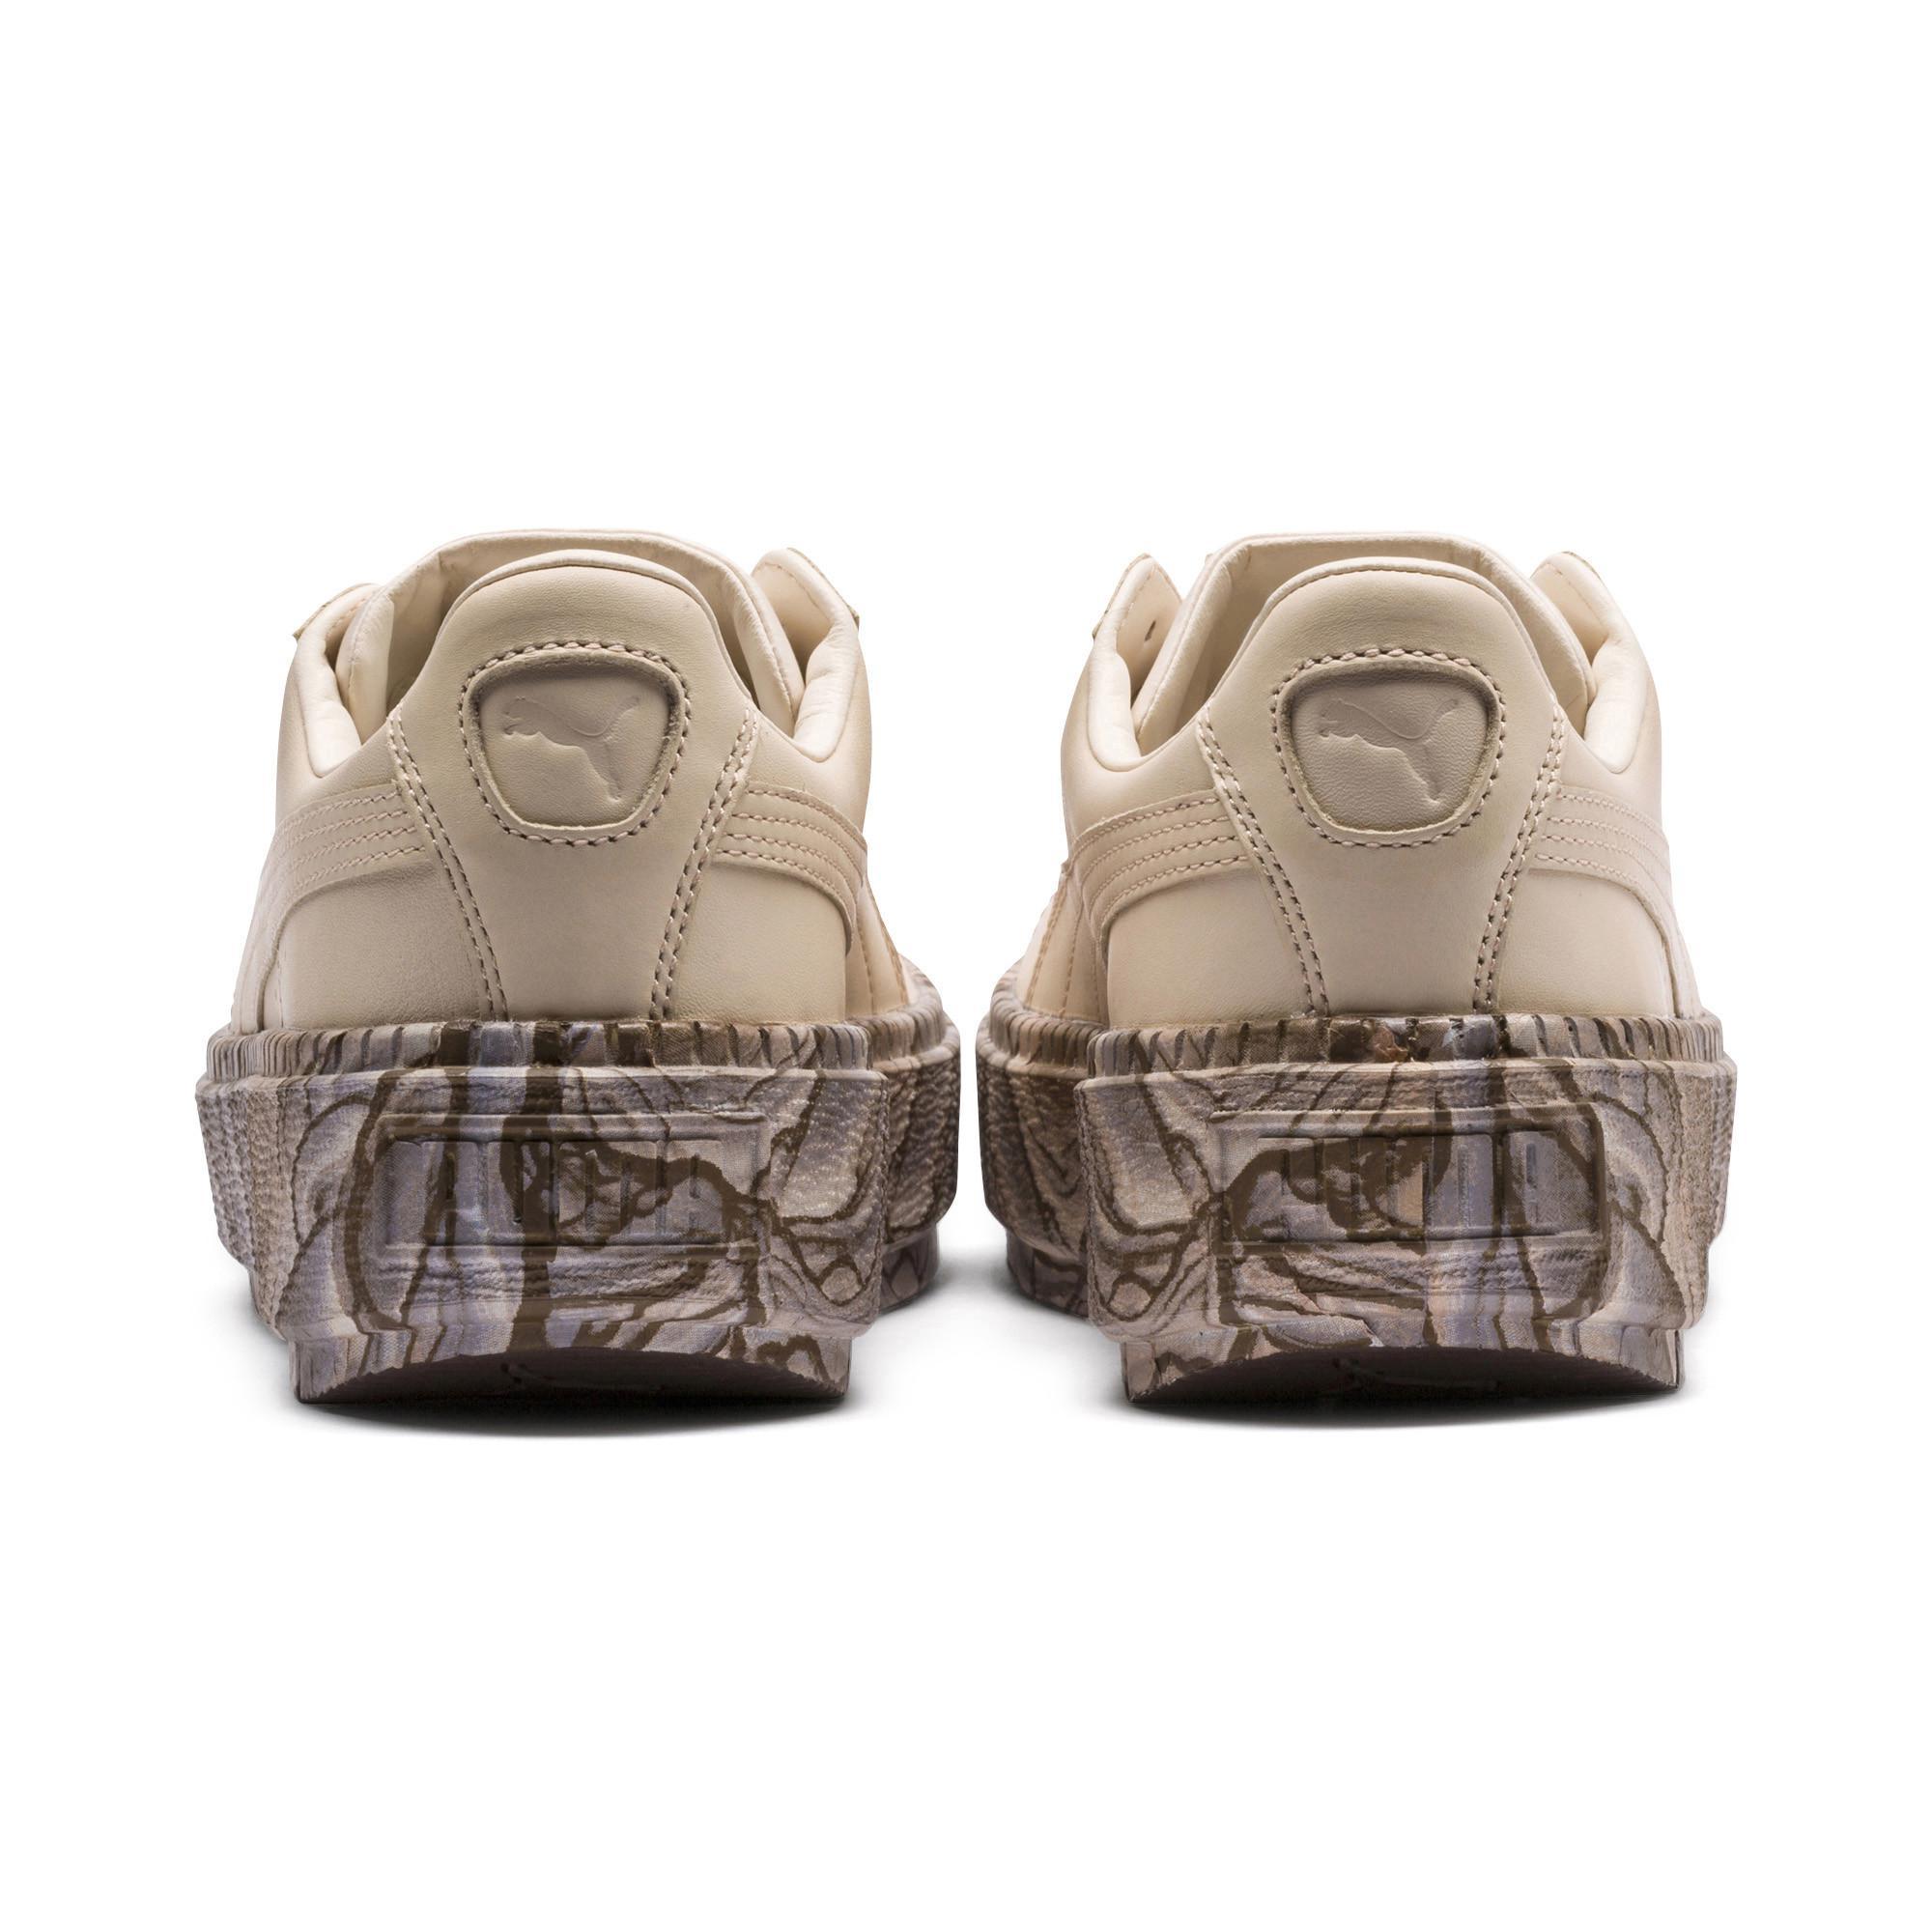 edca2619e74 Lyst - PUMA Platform Trace Mimicry Women s Sneakers in Natural